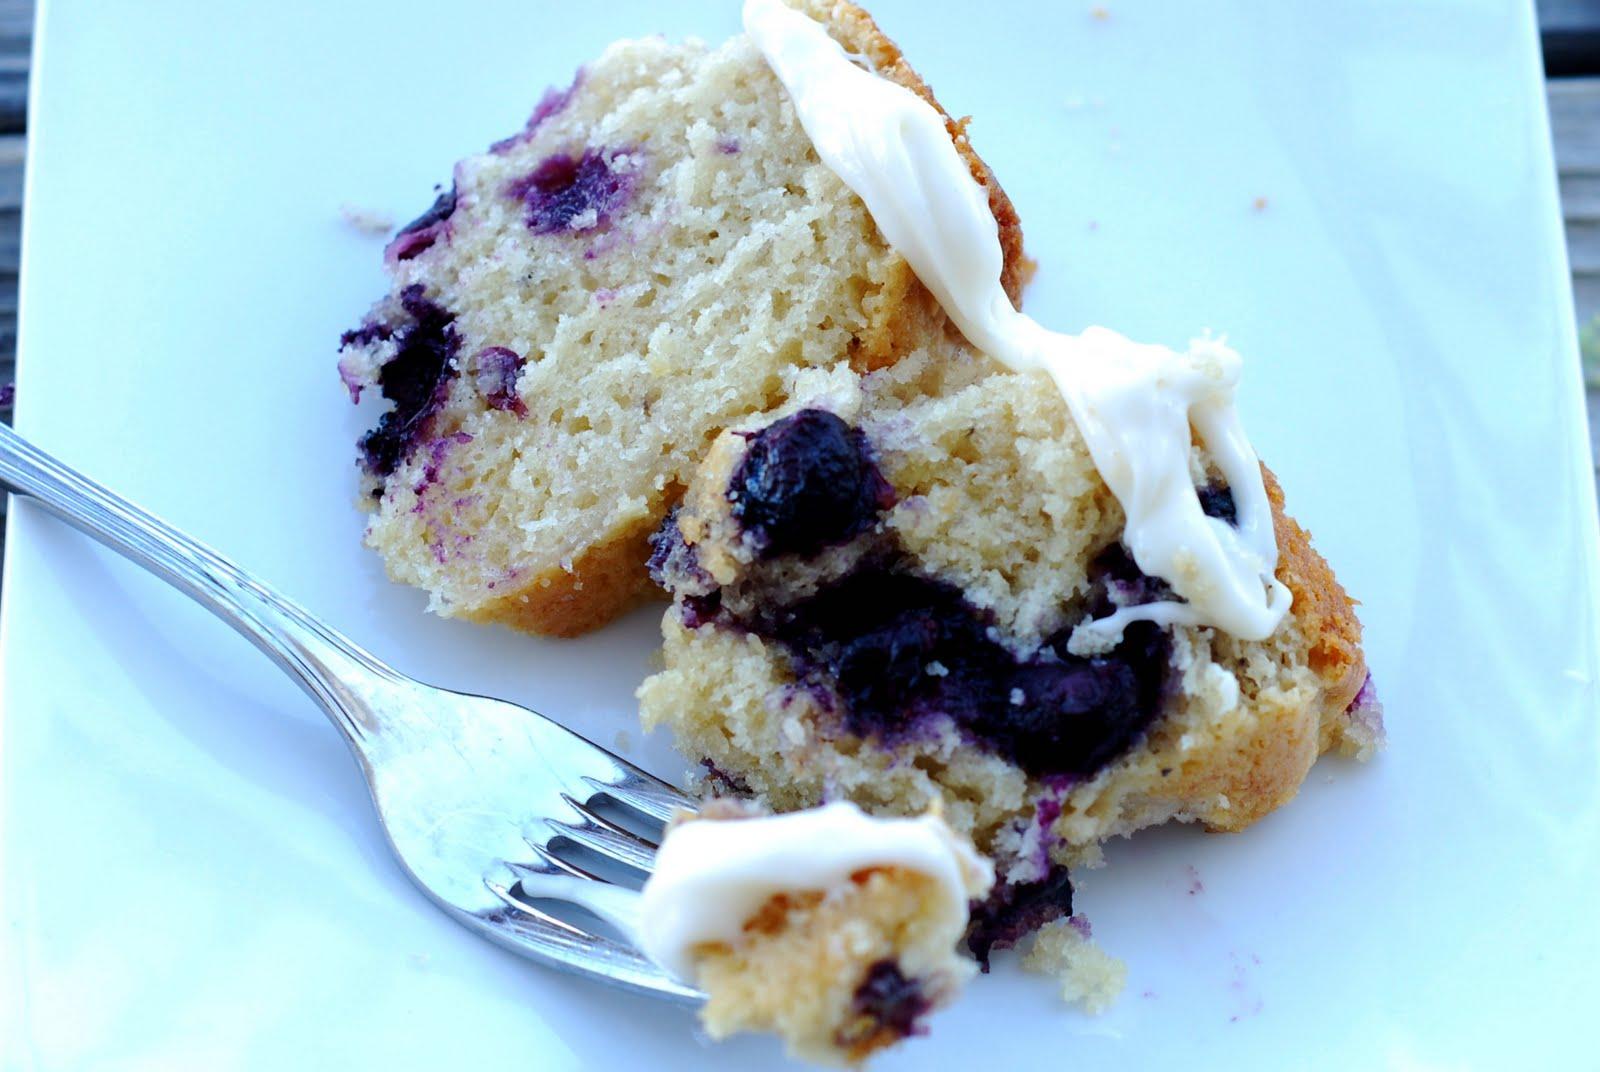 See Jane in the kitchen: Lemon Blueberry Bundt Cake